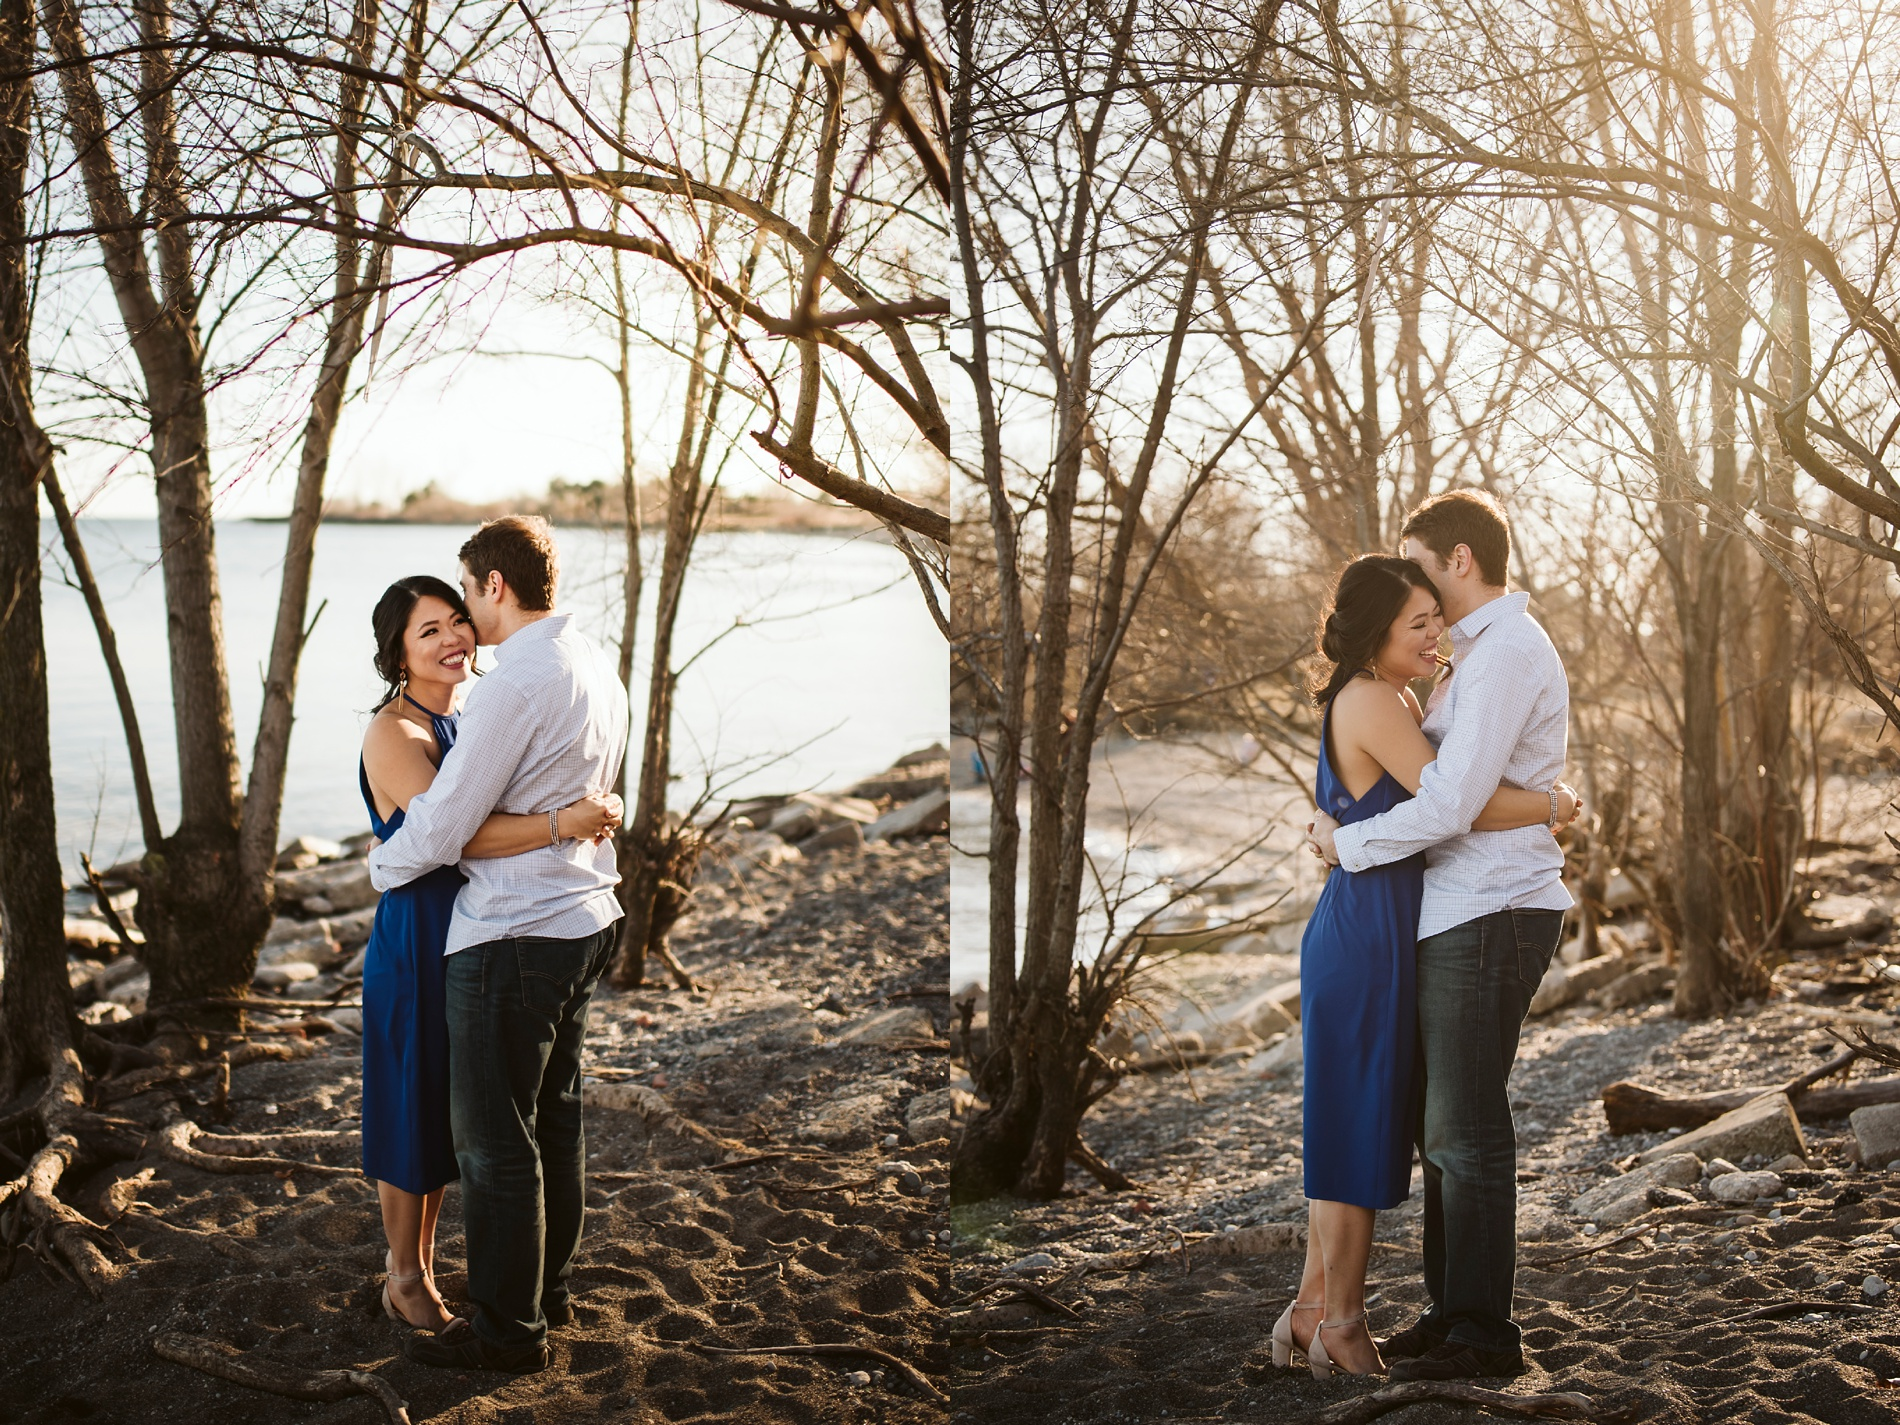 Wedding_photographer_best_toronto_engagement_shoot02.jpg